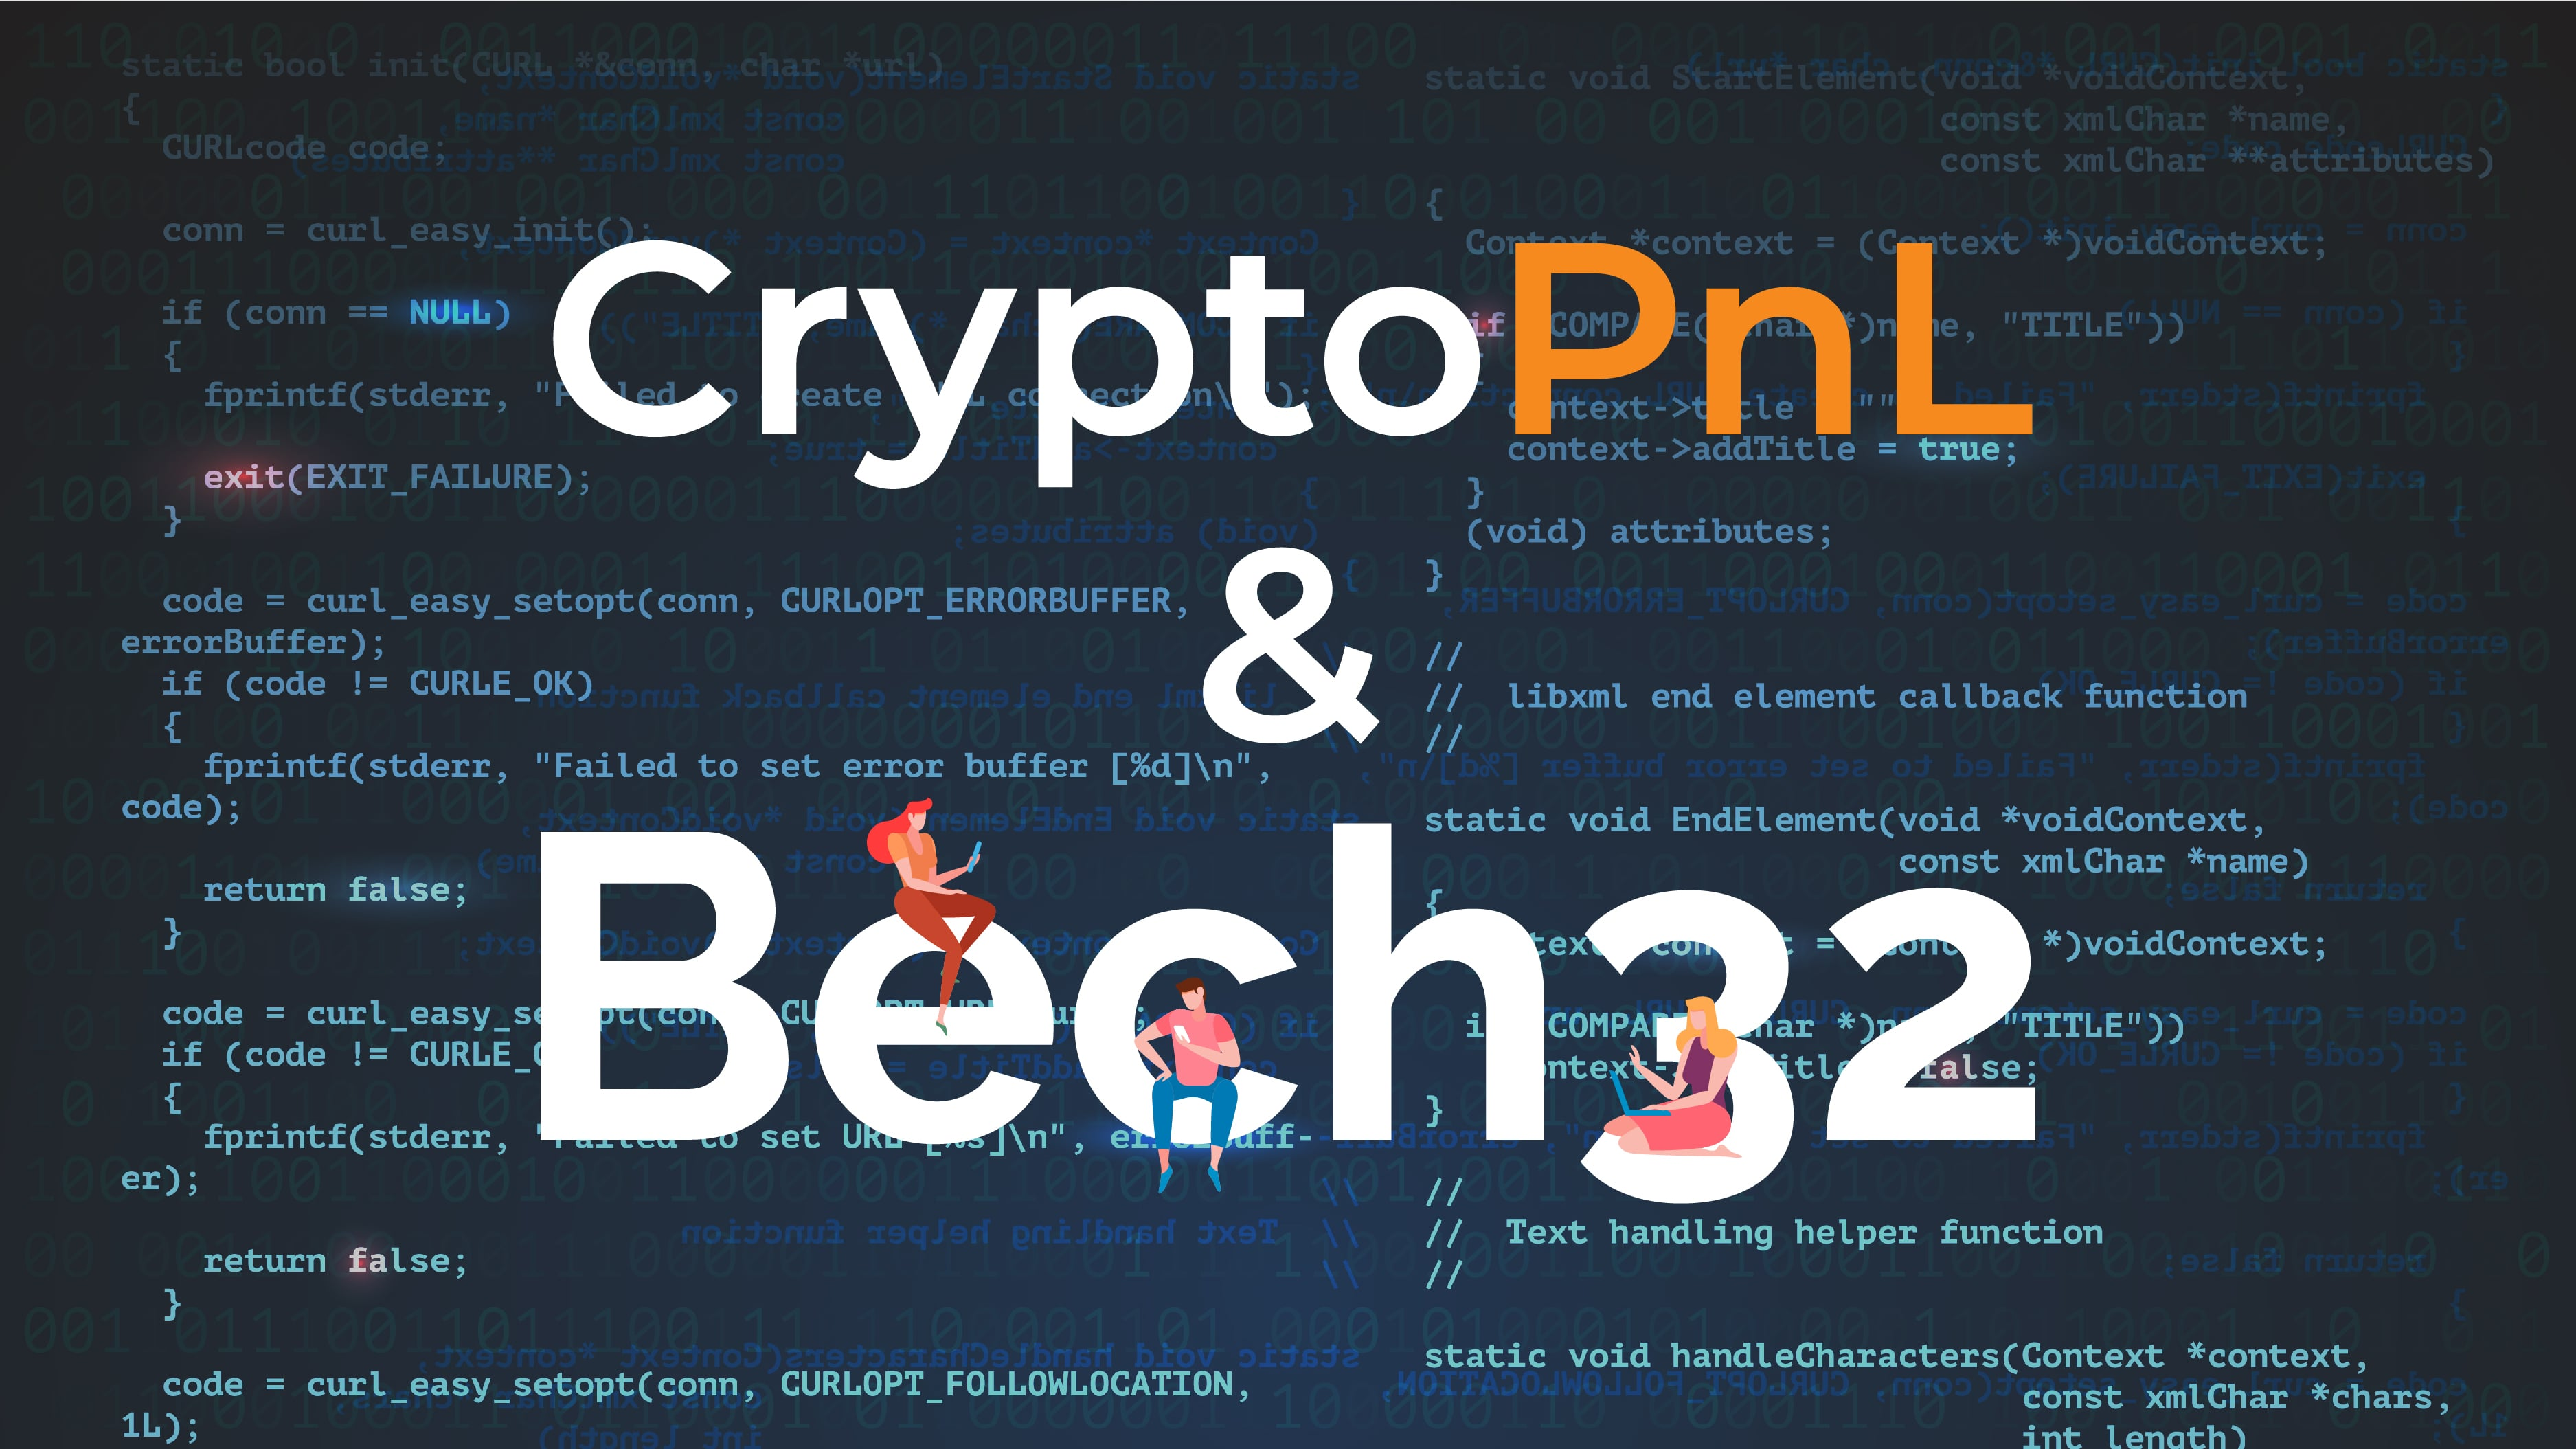 Bech32 bc1 BIP 0173 SegWit